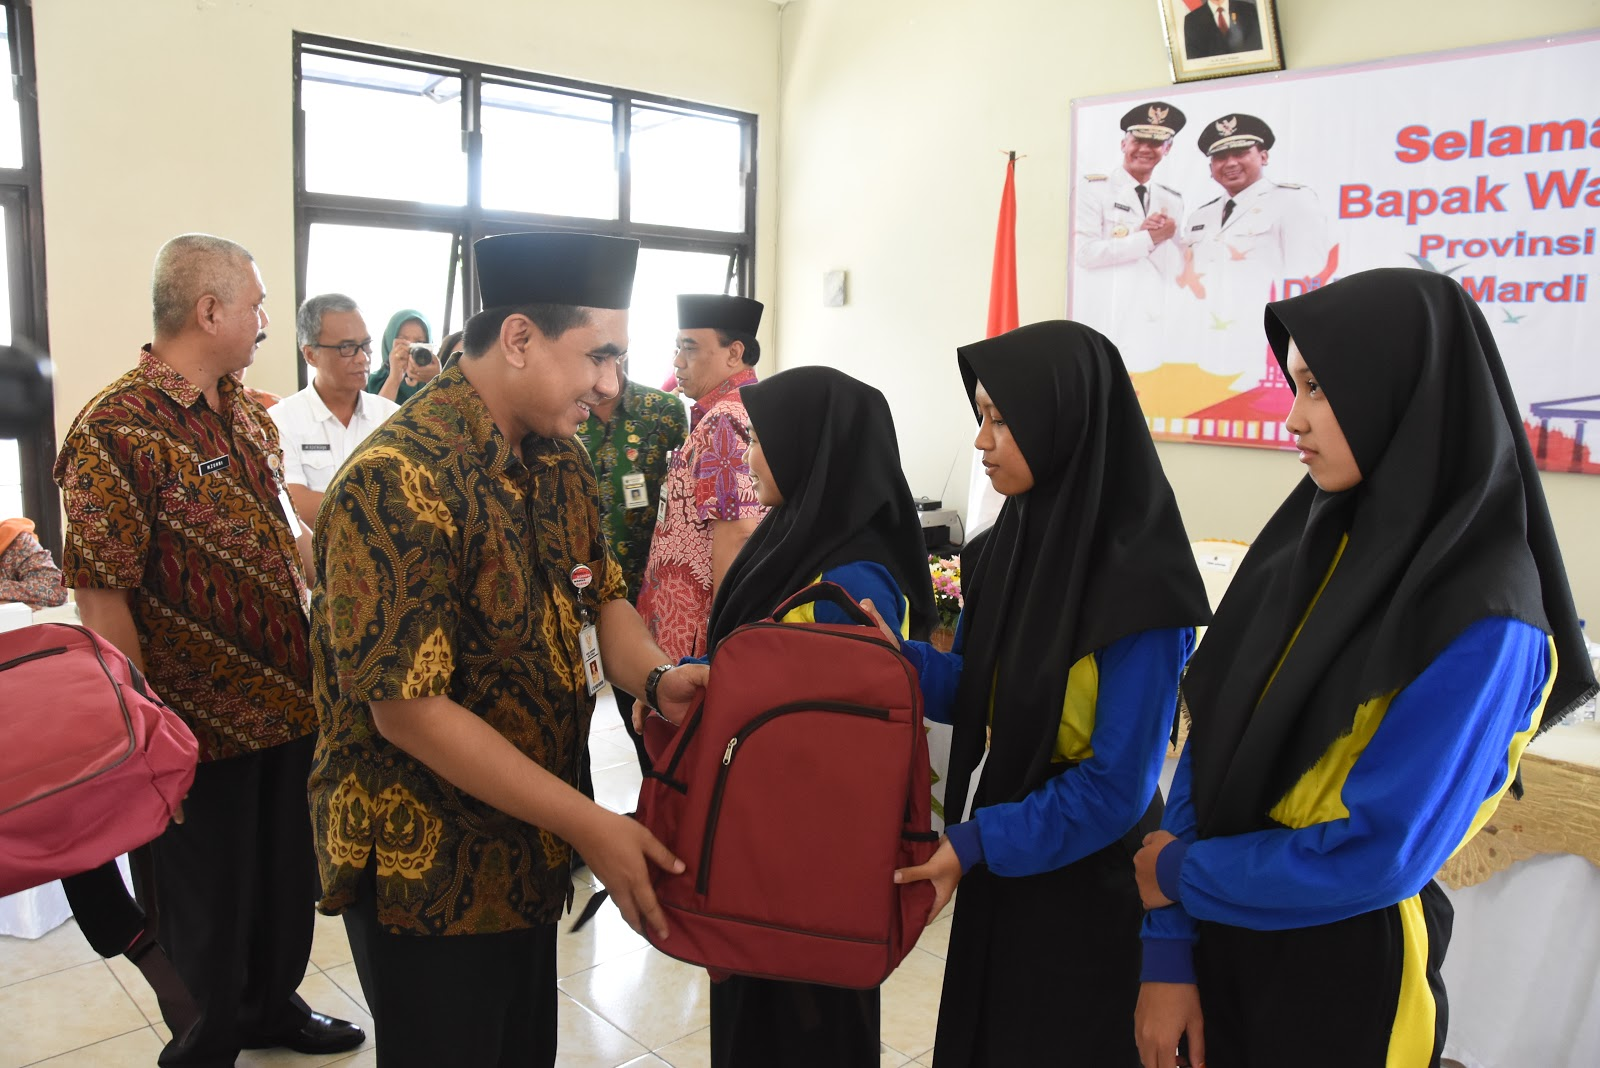 Wagub Jateng Beri Motivasi Anak-Anak RPSA Mardi Yuwono